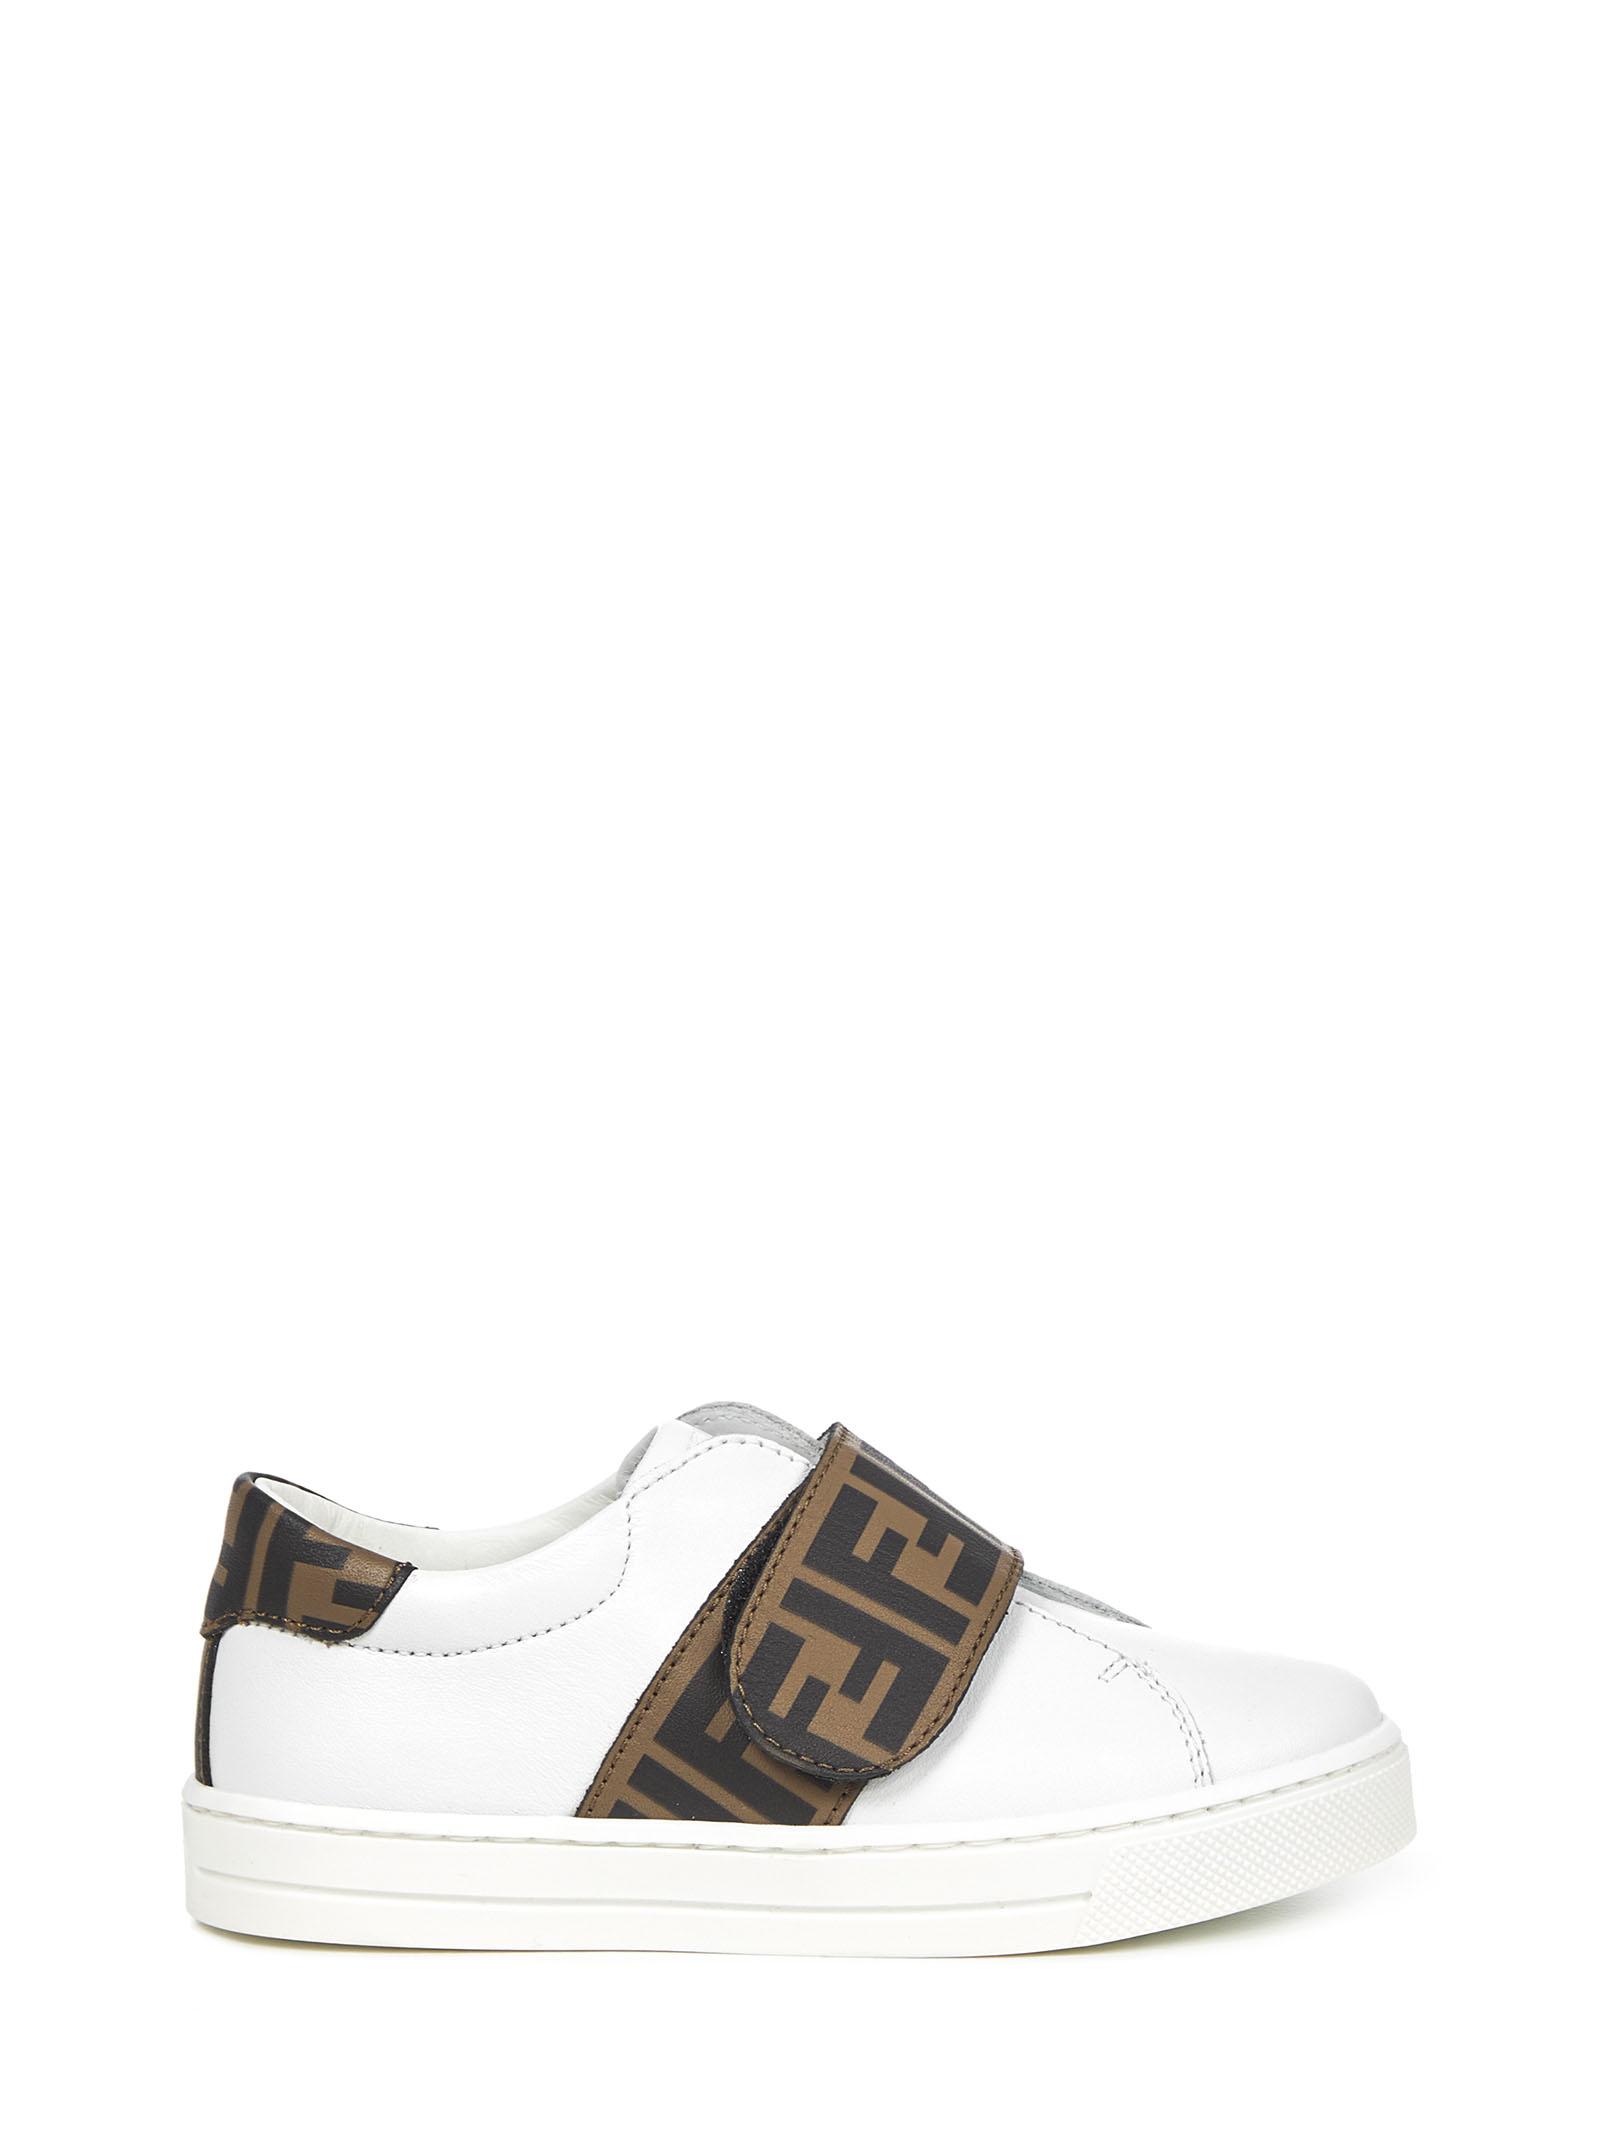 Fendi Kids Sneakers - Fendi Kids